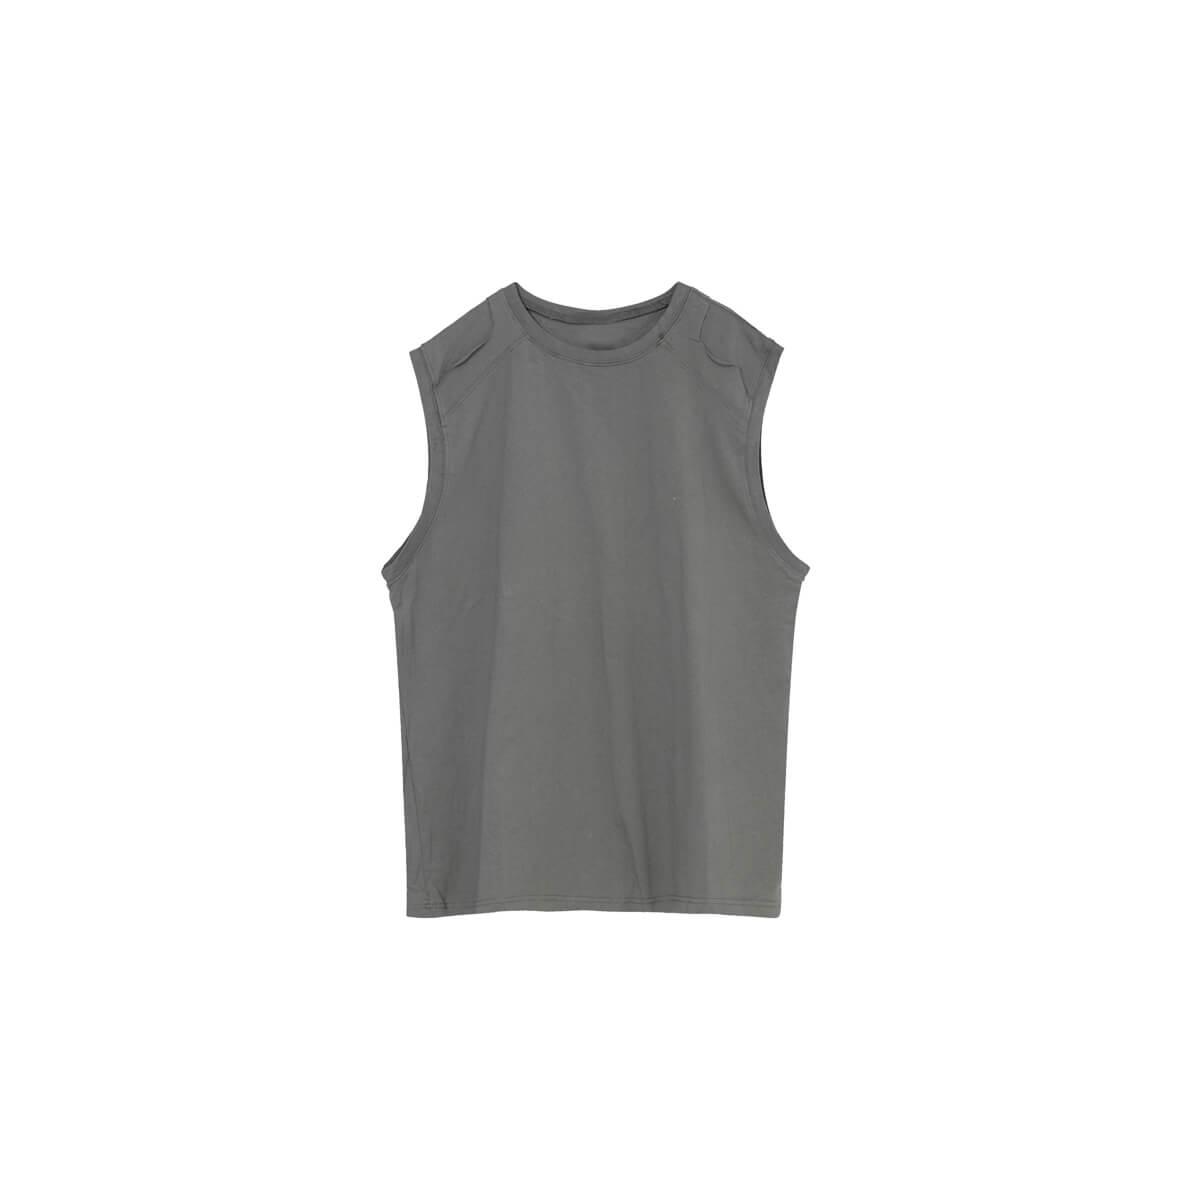 Майка Cui Layout Studio Tank Top Ripped Shoulders Gray